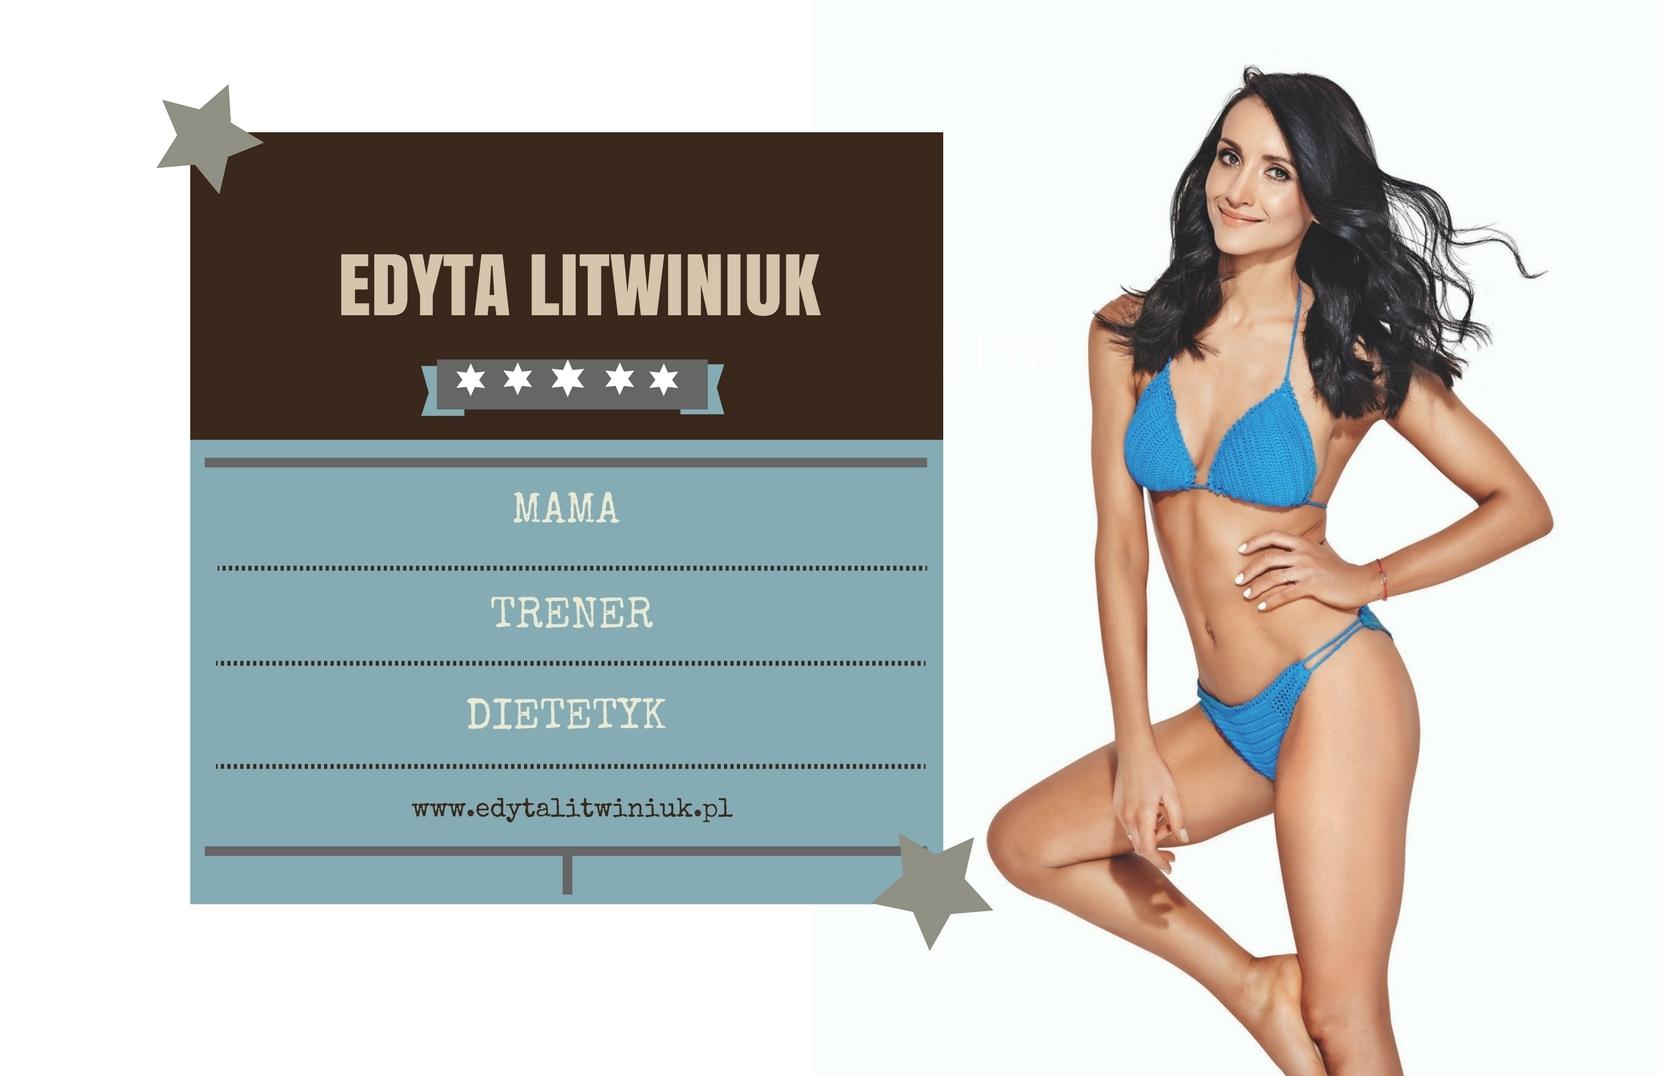 Edyta Litwiniuk   Trening-Dieta-Styl życia